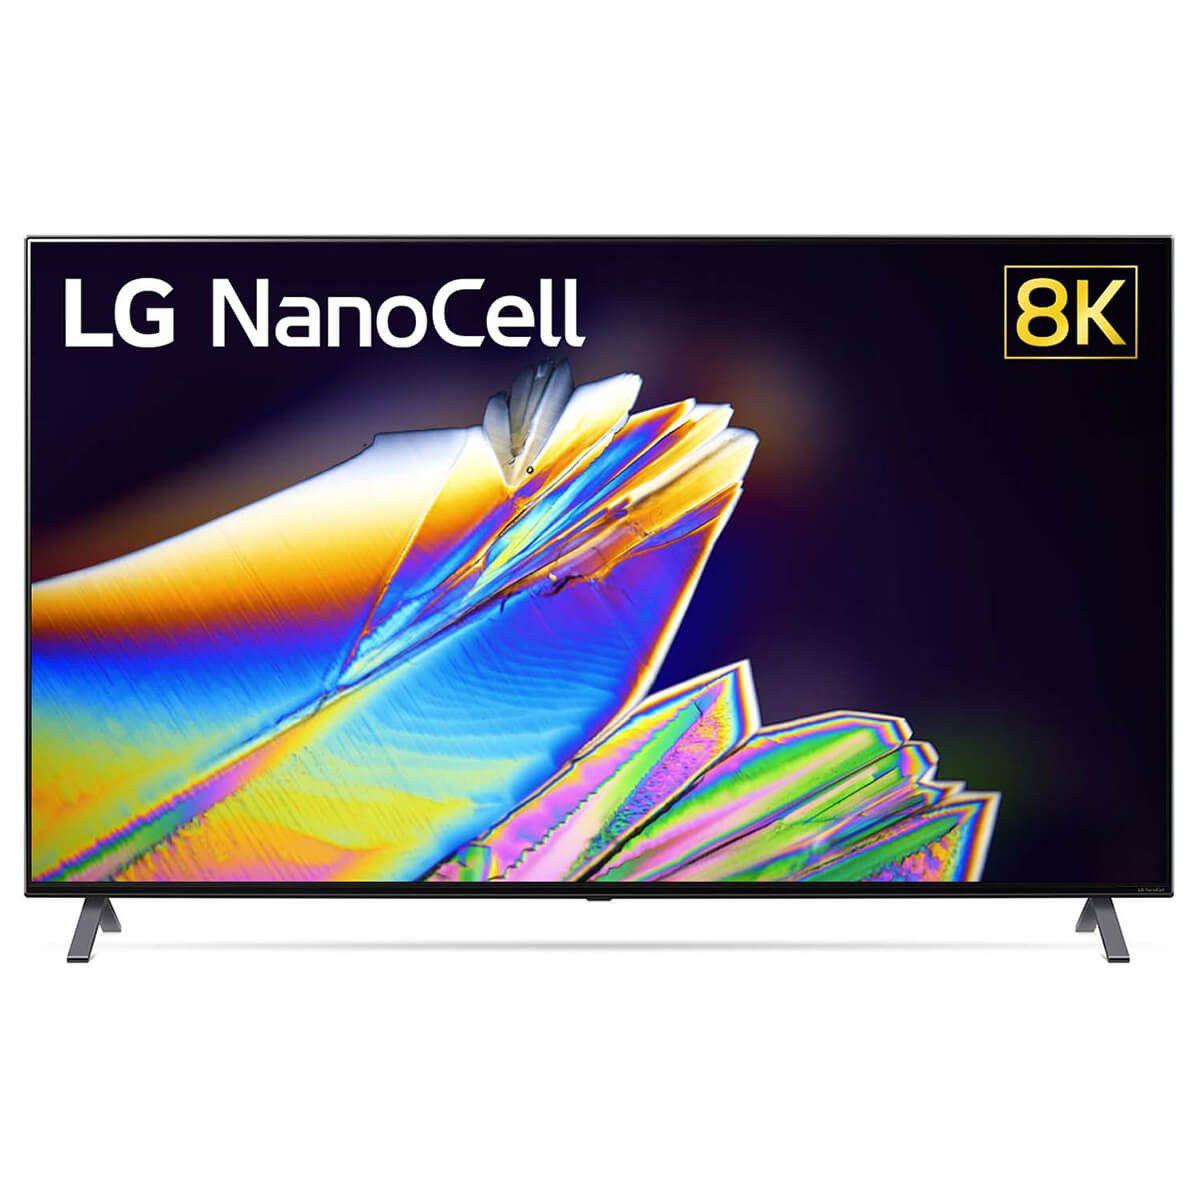 LG 55NANO956NA.AEU Smart TV 8K UHD NanoCell